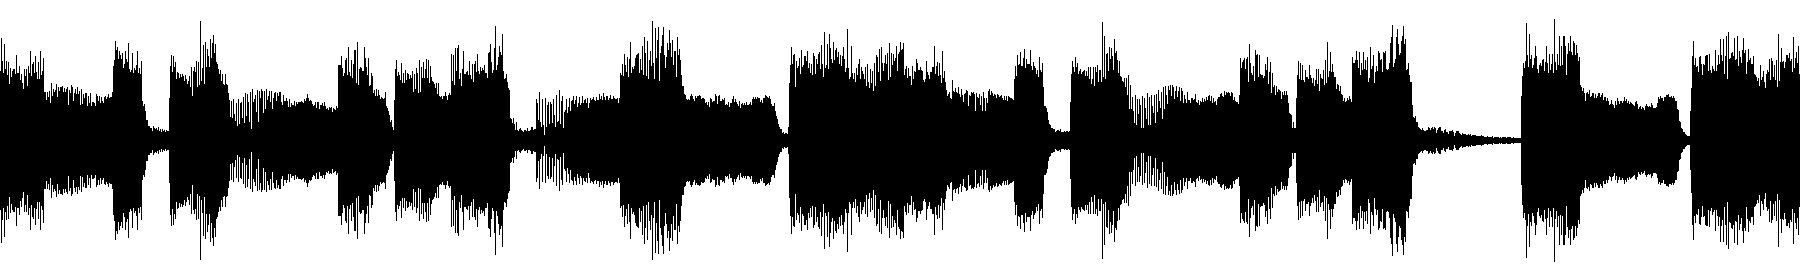 chordssynth neverleavemealone 86 d